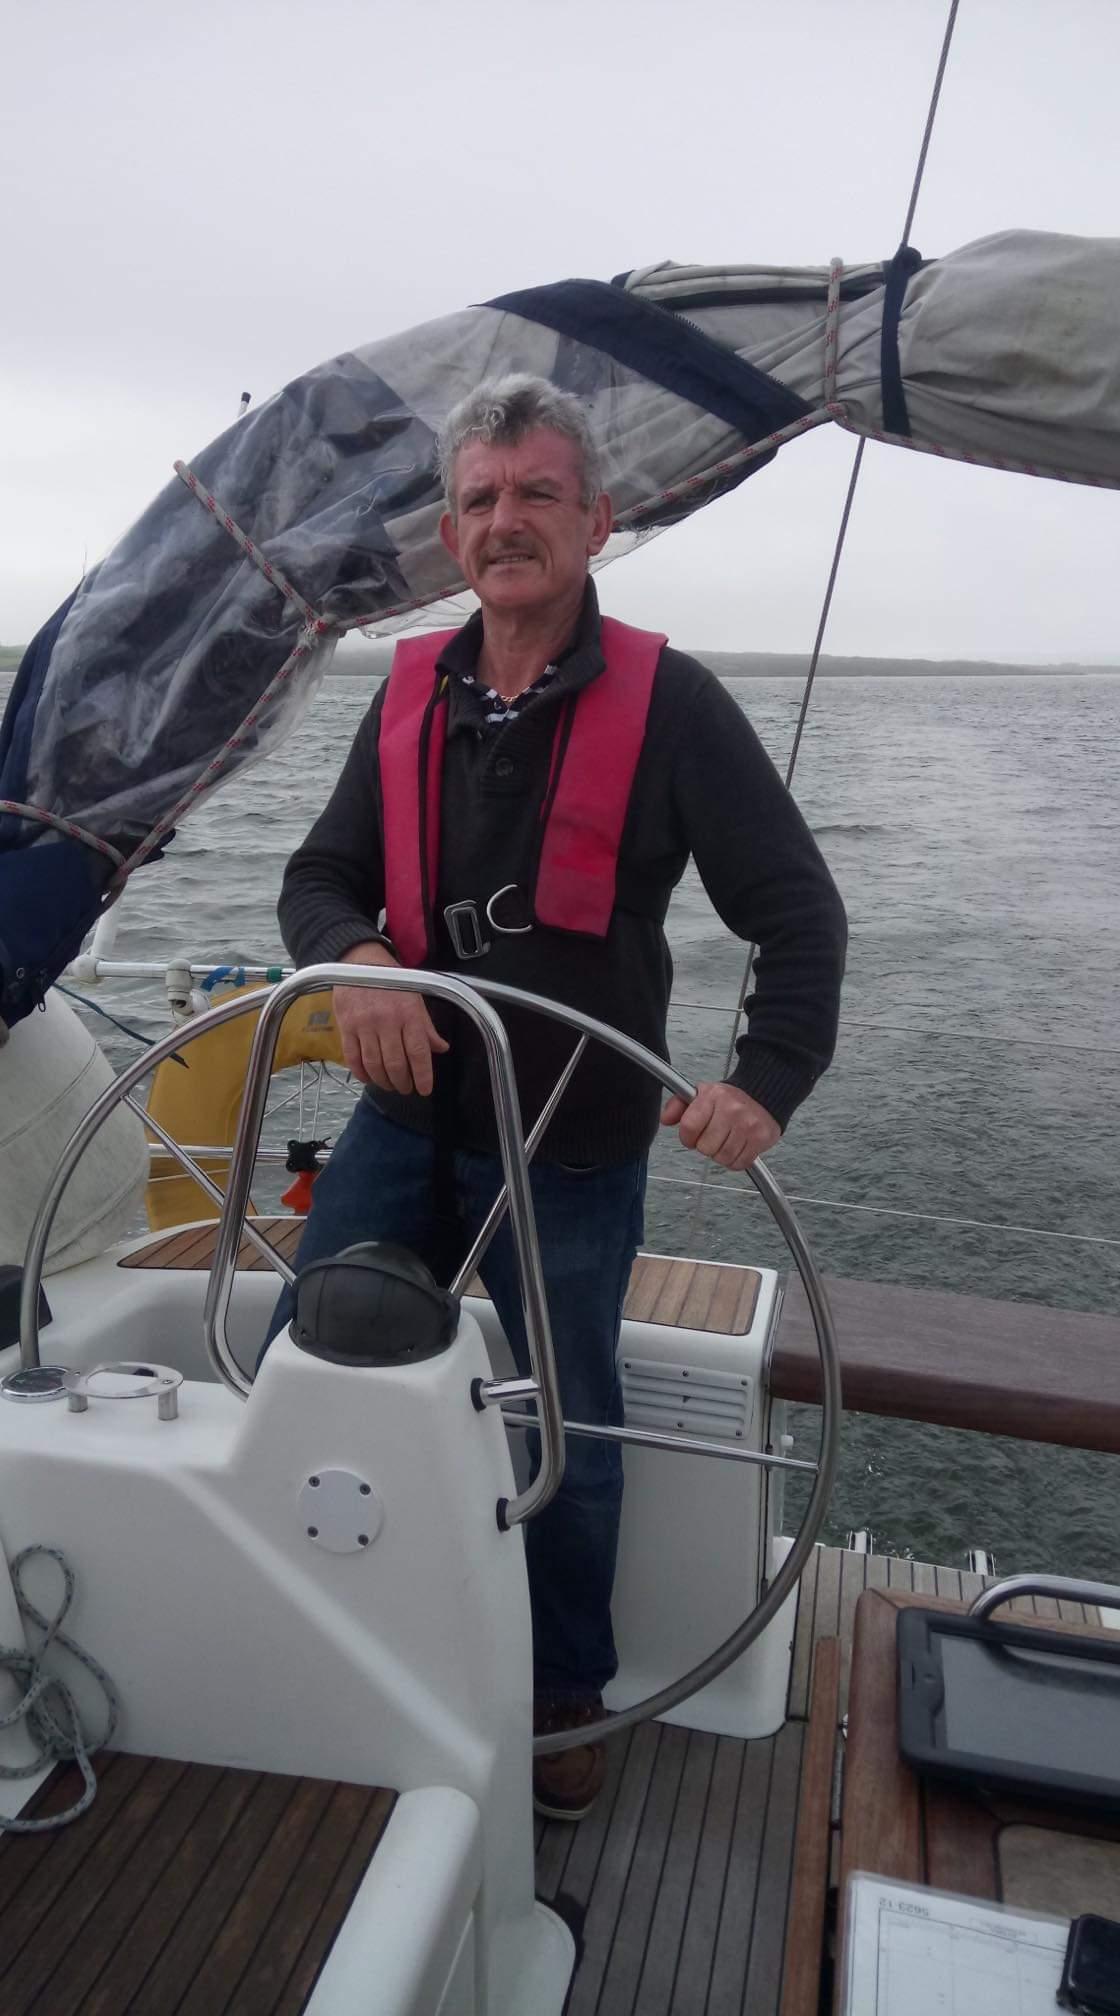 Edward Doherty, Proprietor & Skipper